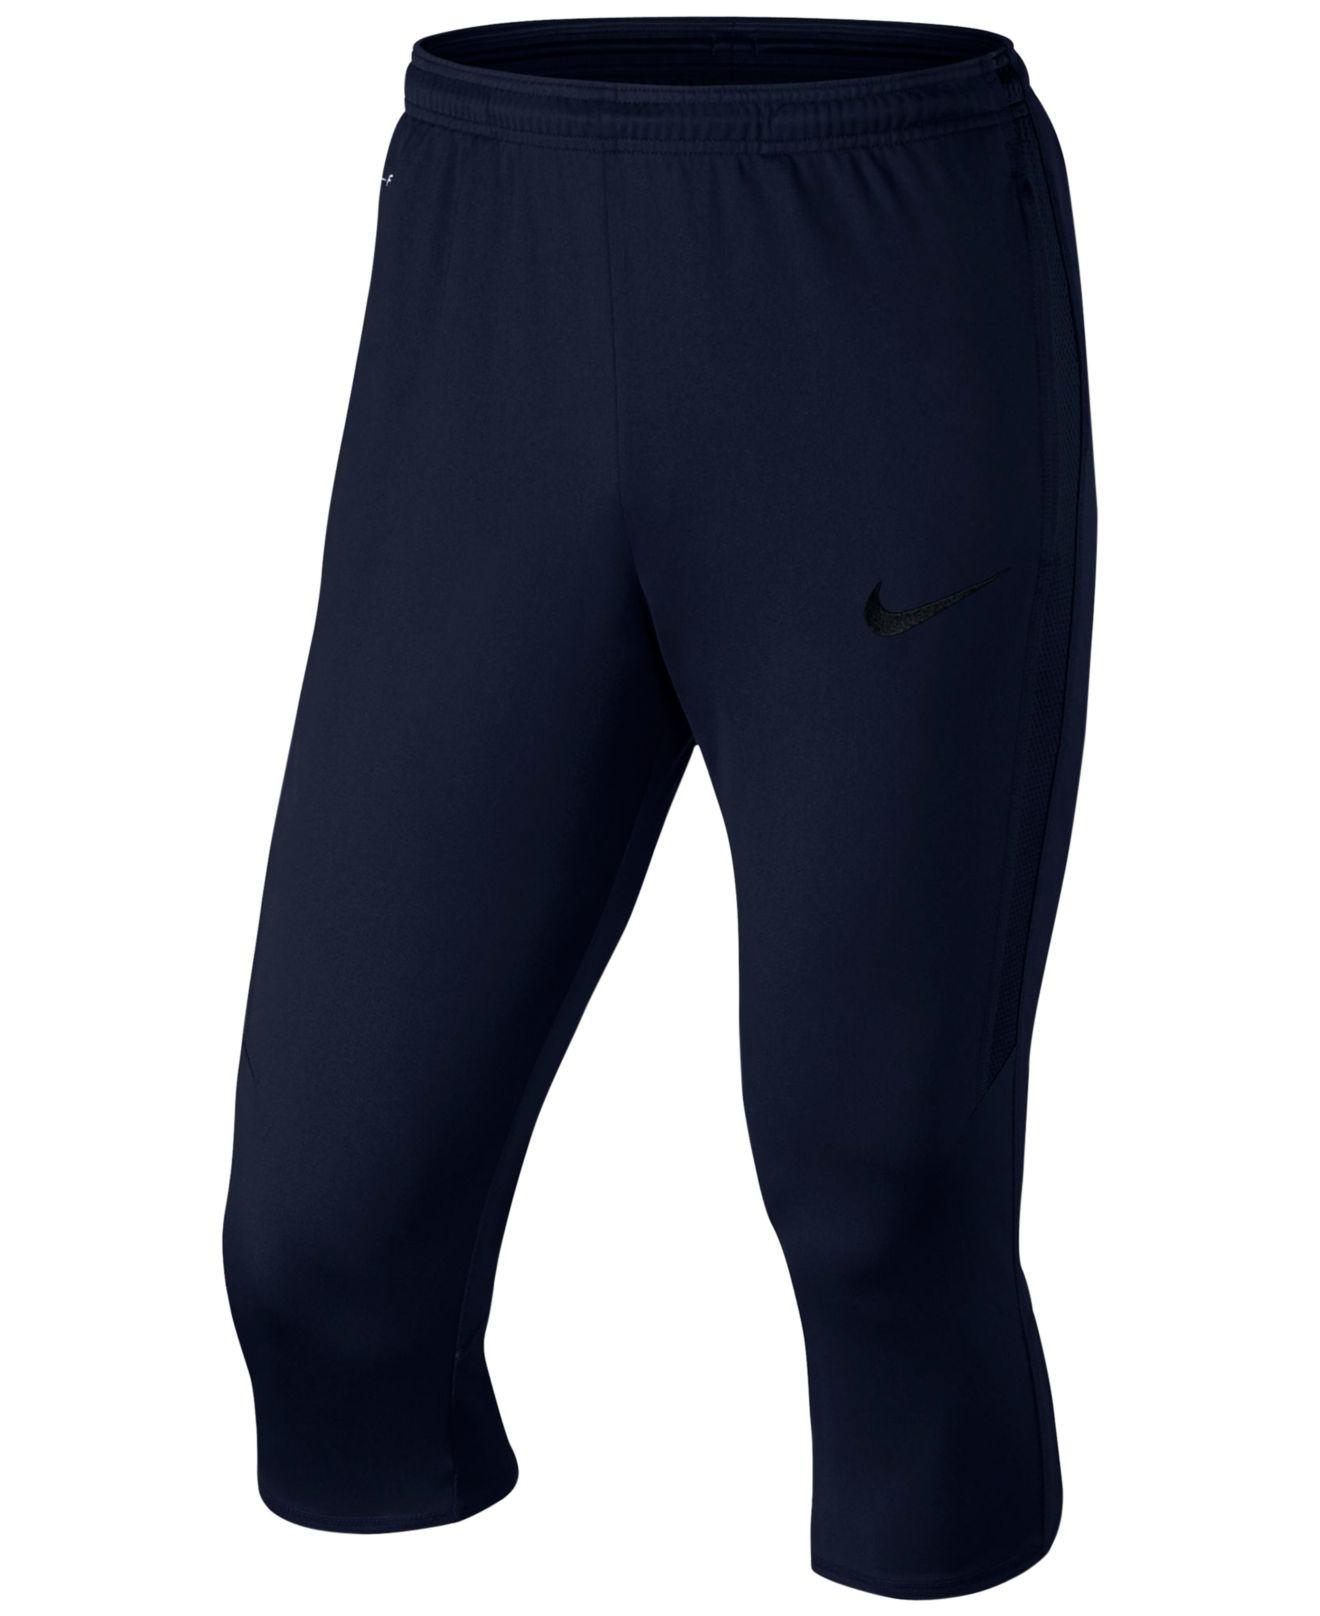 Nike Men's Strike Dri-fit Soccer 3/4 Tech Pants in Black ...